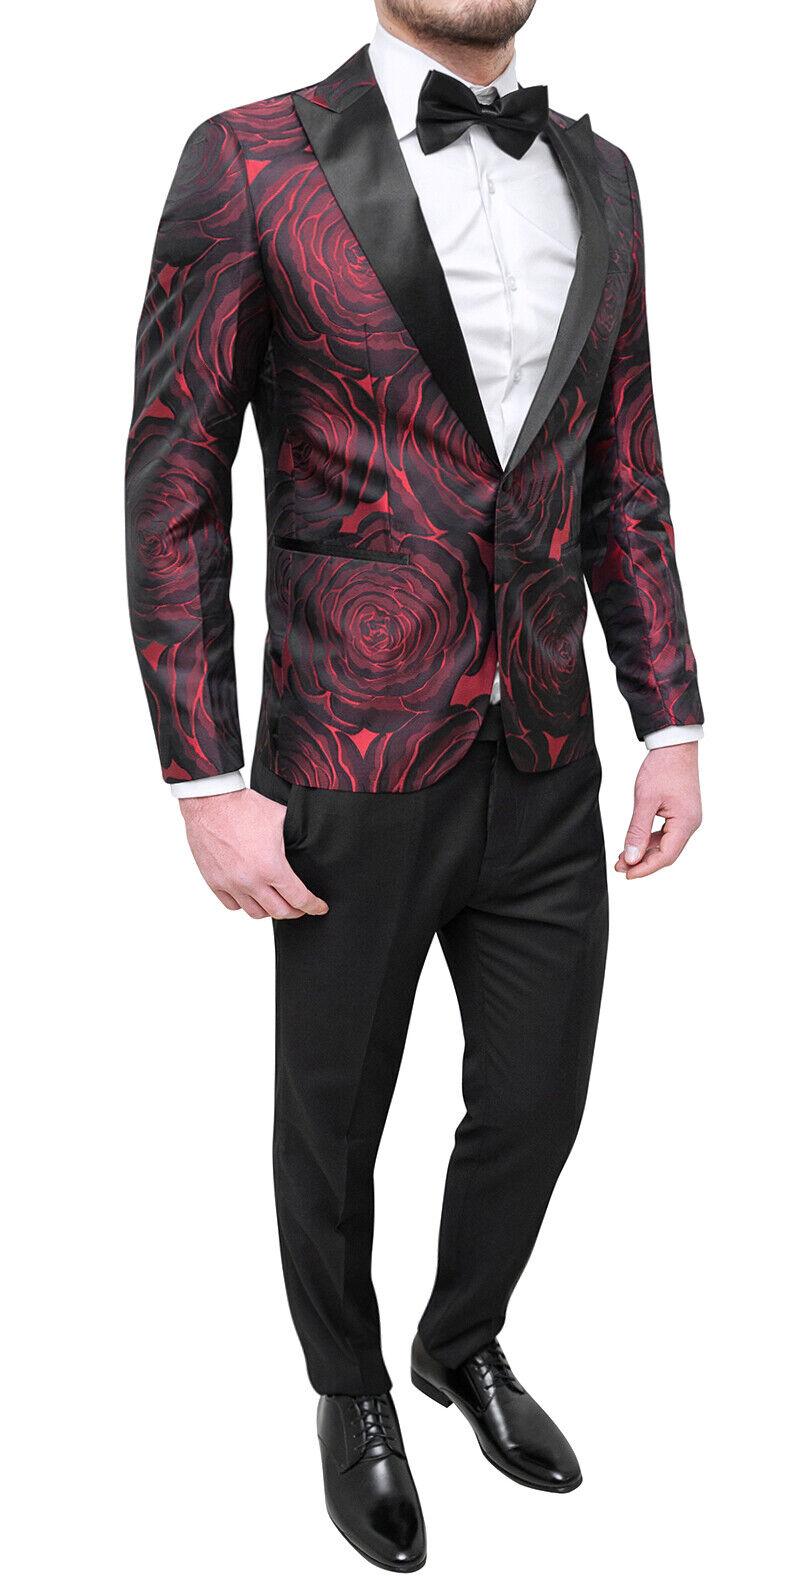 Suit Complete Man Satin Floral Red Smoking Elegant Groom Wedding Gift-